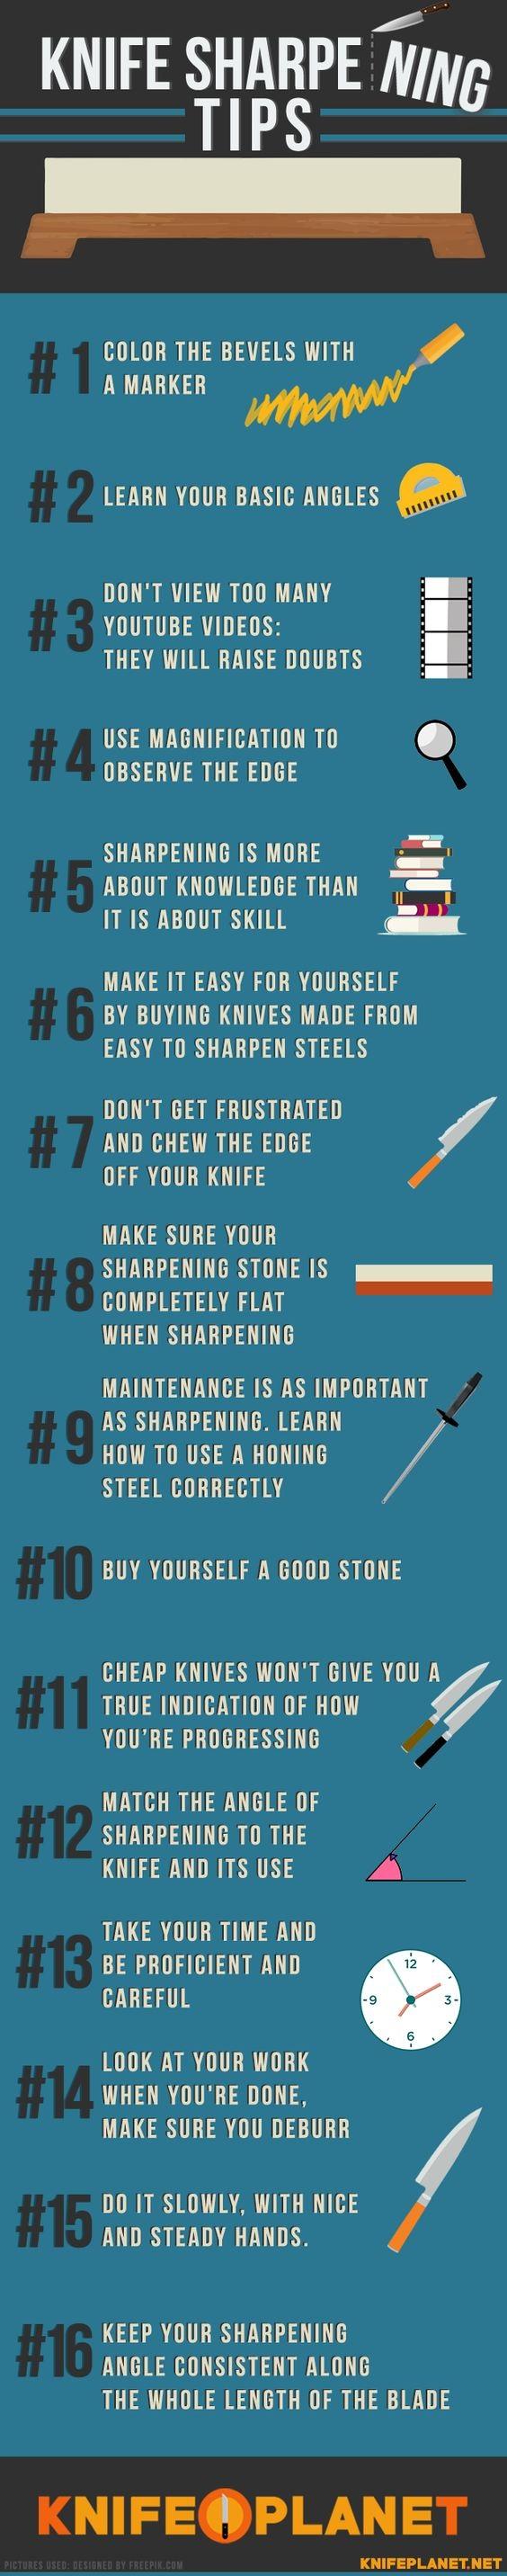 shapening